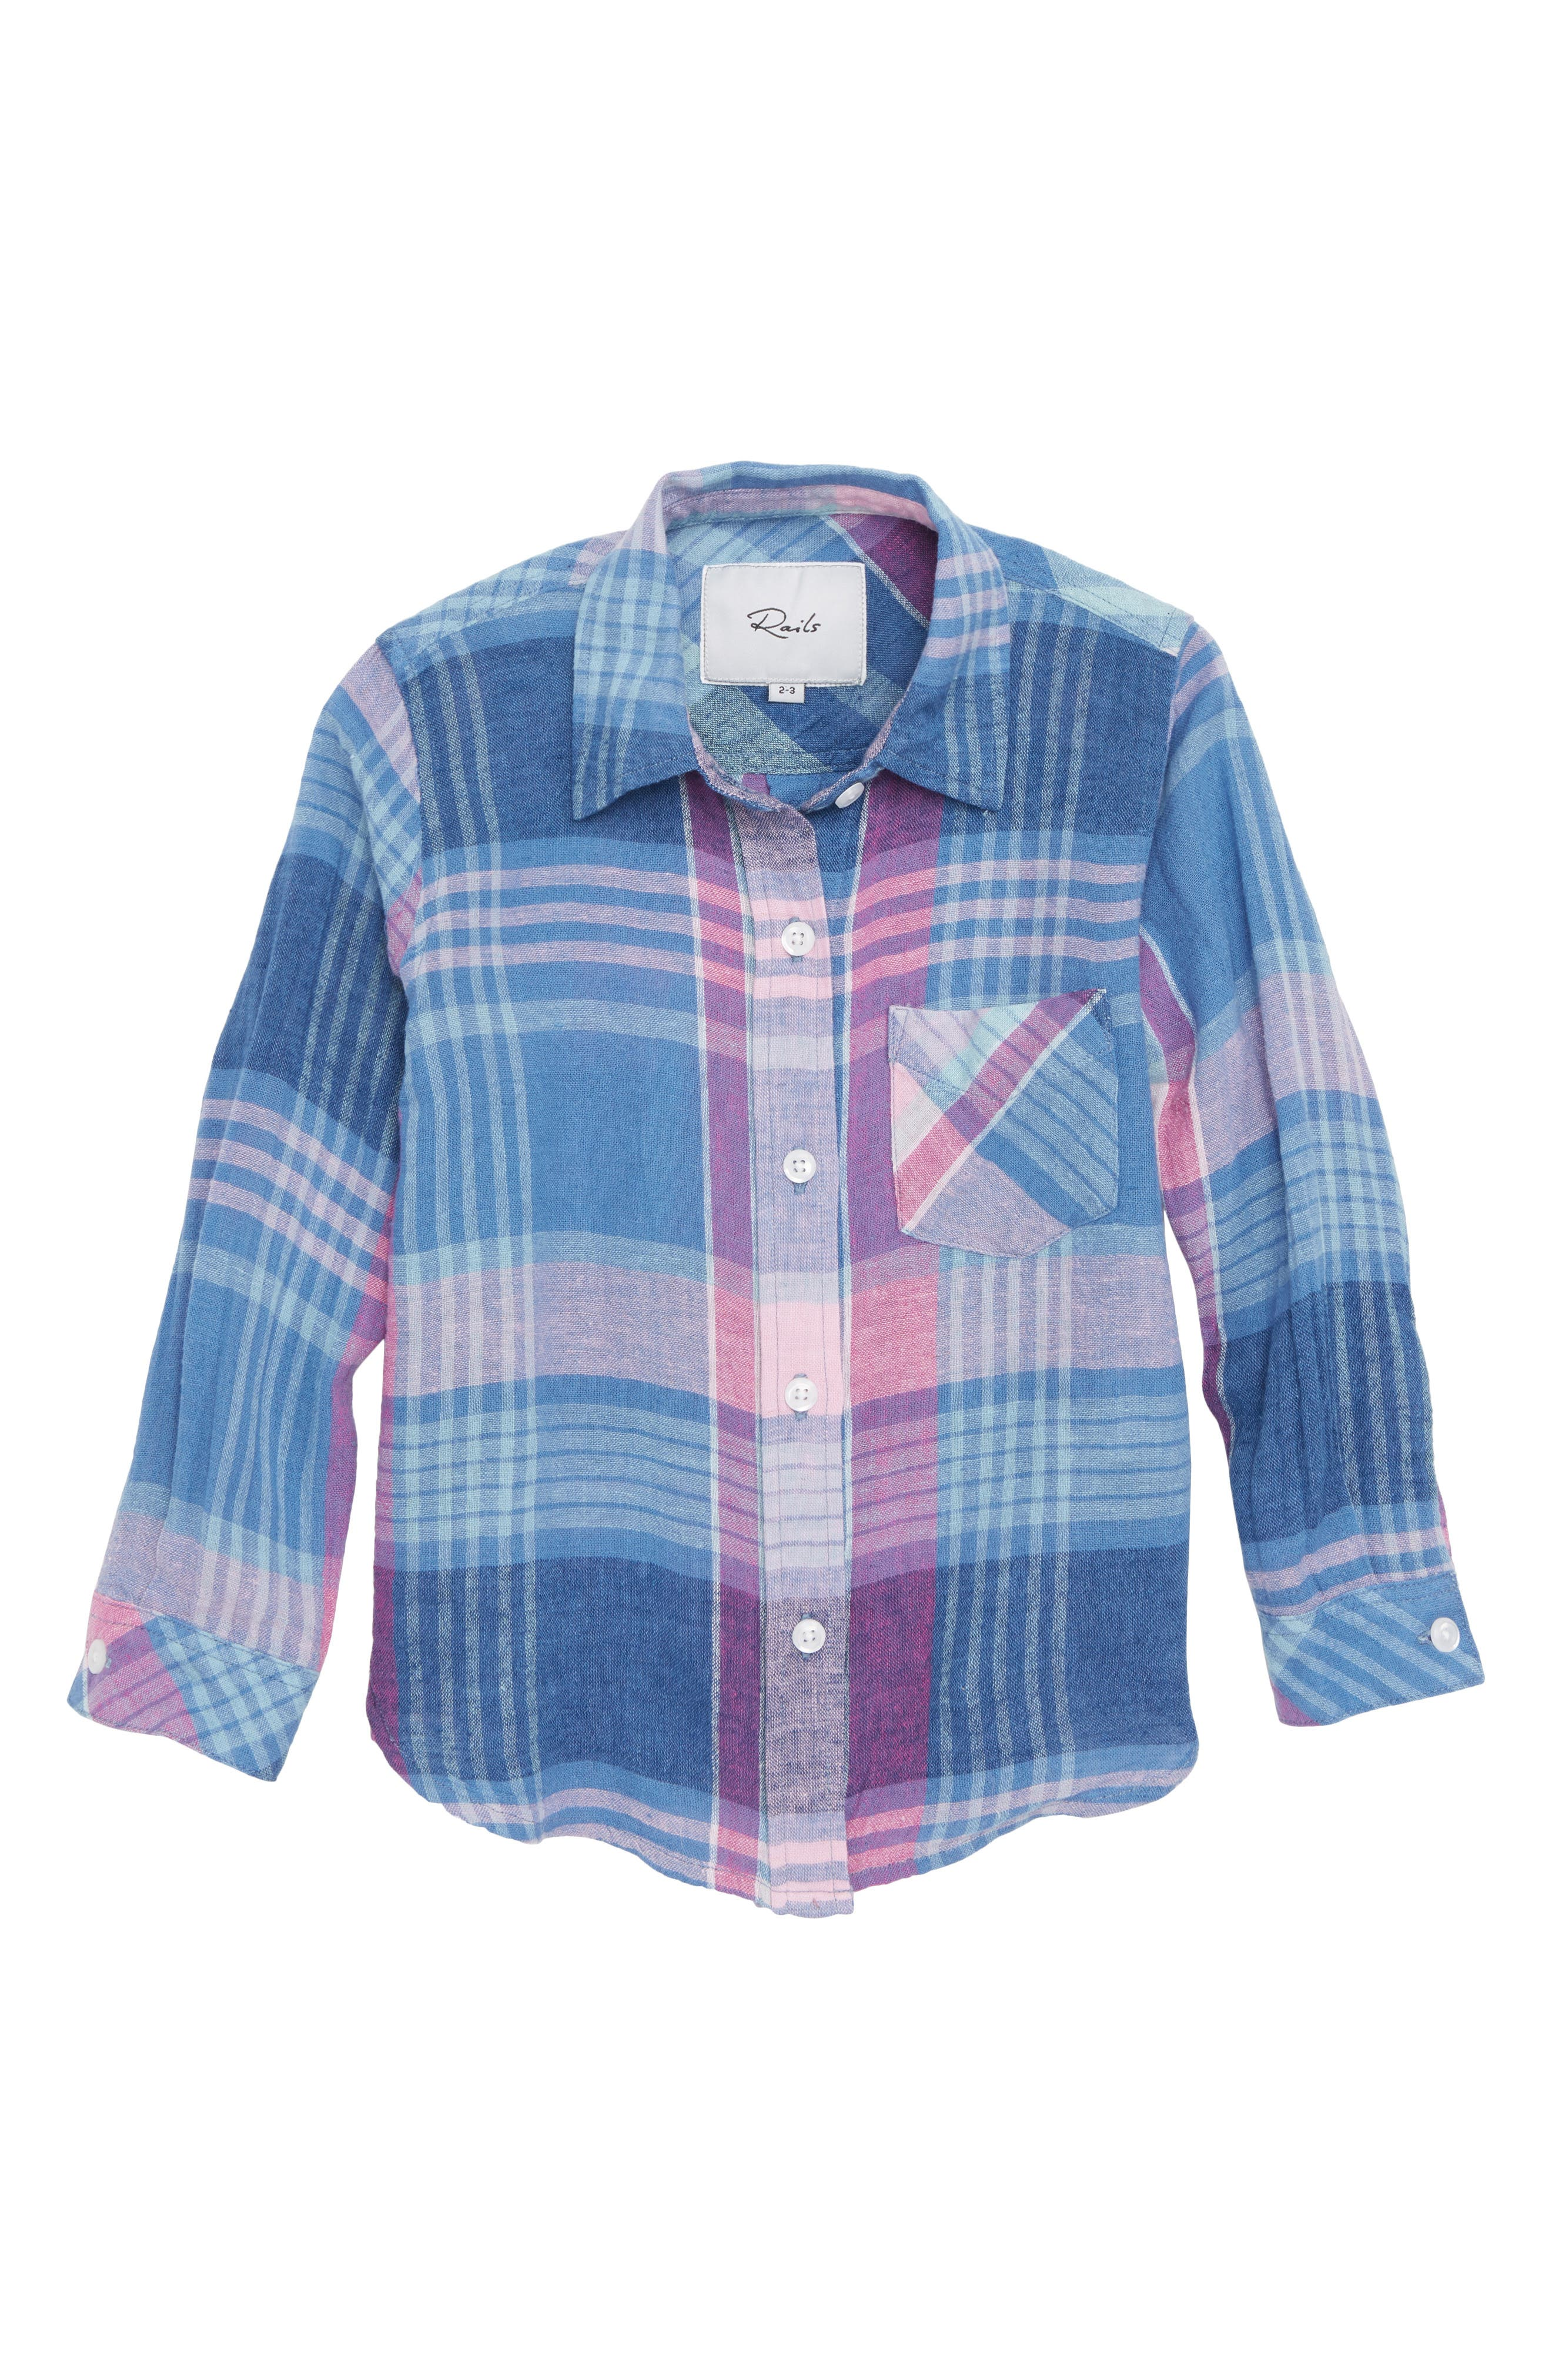 Cora Plaid Shirt,                             Main thumbnail 1, color,                             Laguna Coast Azaela